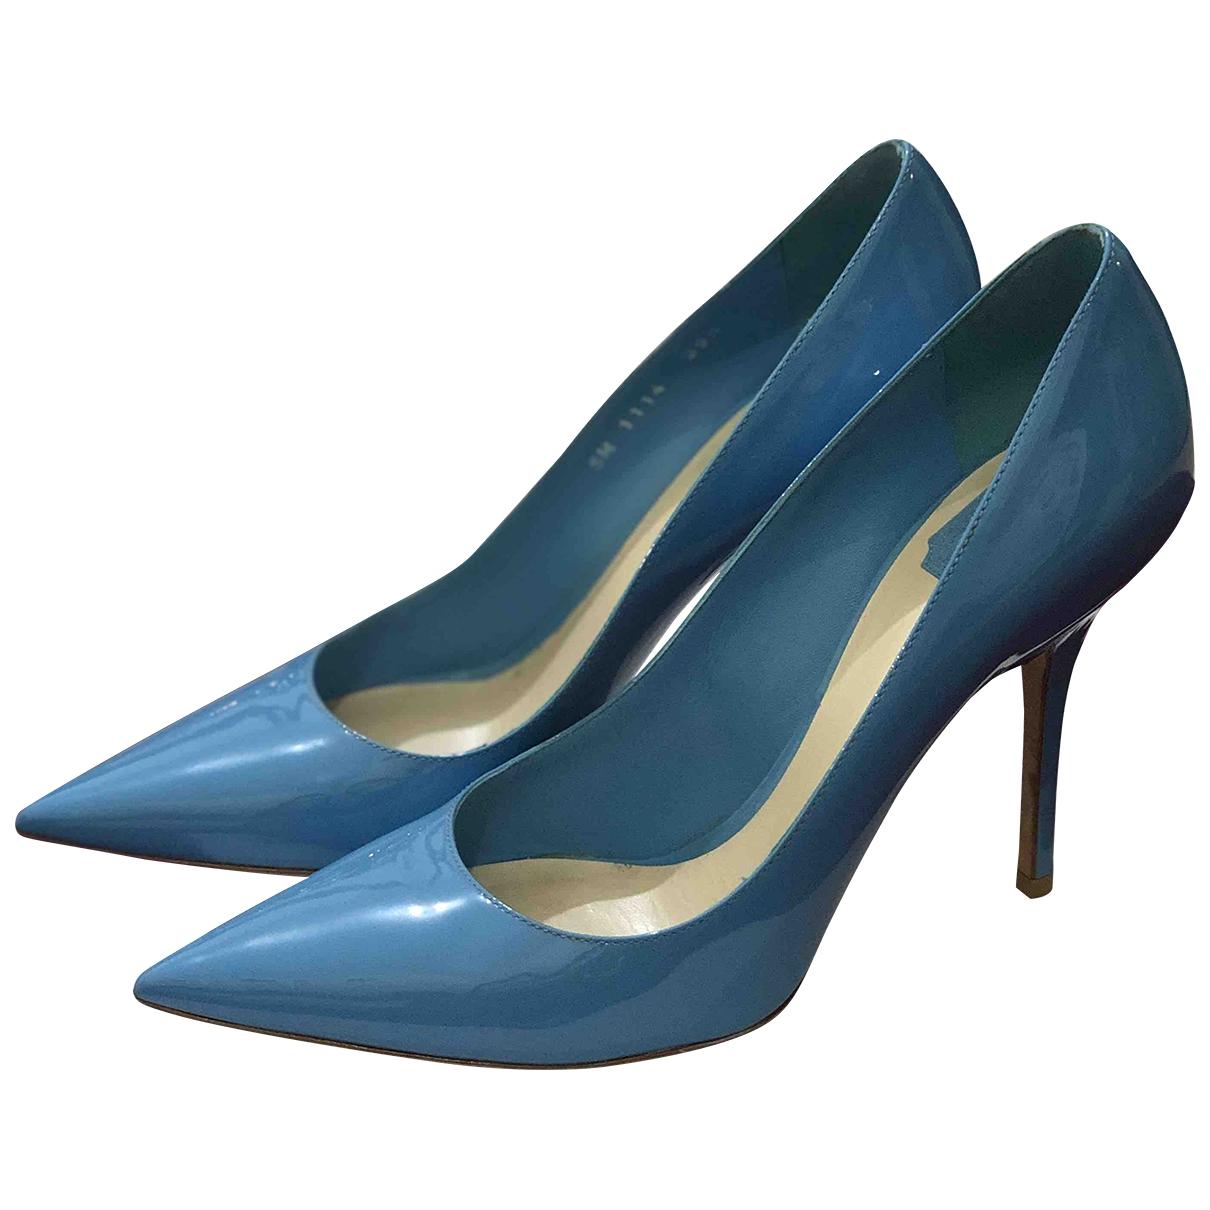 Dior - Escarpins   pour femme en cuir verni - bleu